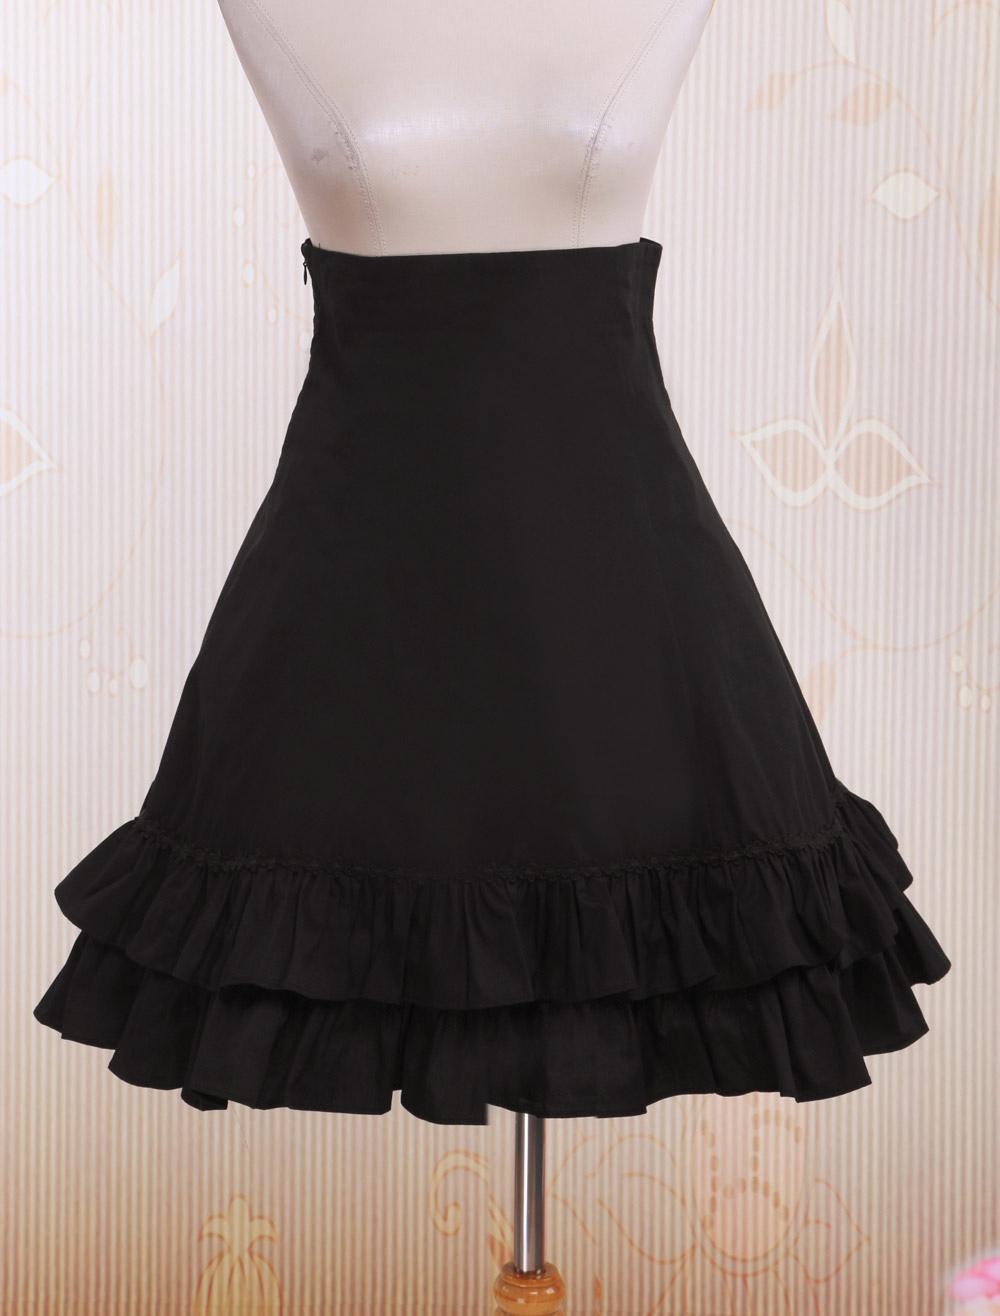 Buy Black High Waist Lolita Short Skirt Lace Up Layered Ruffles for $39.89 in Milanoo store